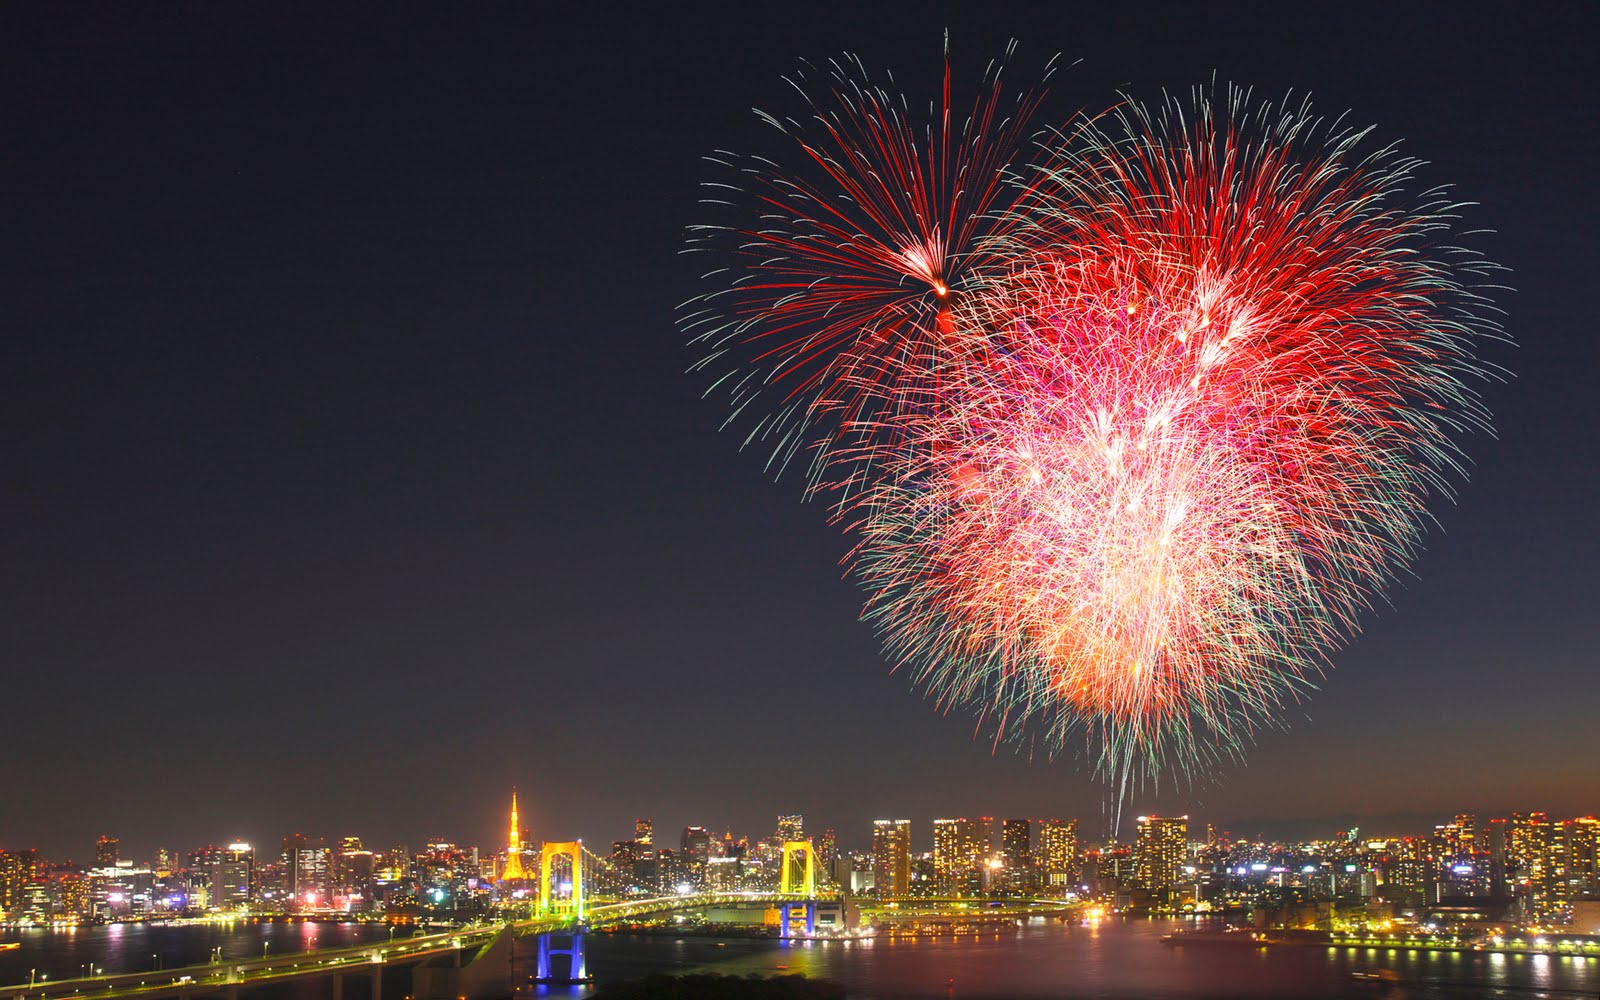 http://4.bp.blogspot.com/-7-d5LhNsS38/TckTu3FrjOI/AAAAAAAAA4I/JkRZvrovwHI/s1600/3.fireworks+display+over+odaiba%252C+tokyo%252C+japan.jpg